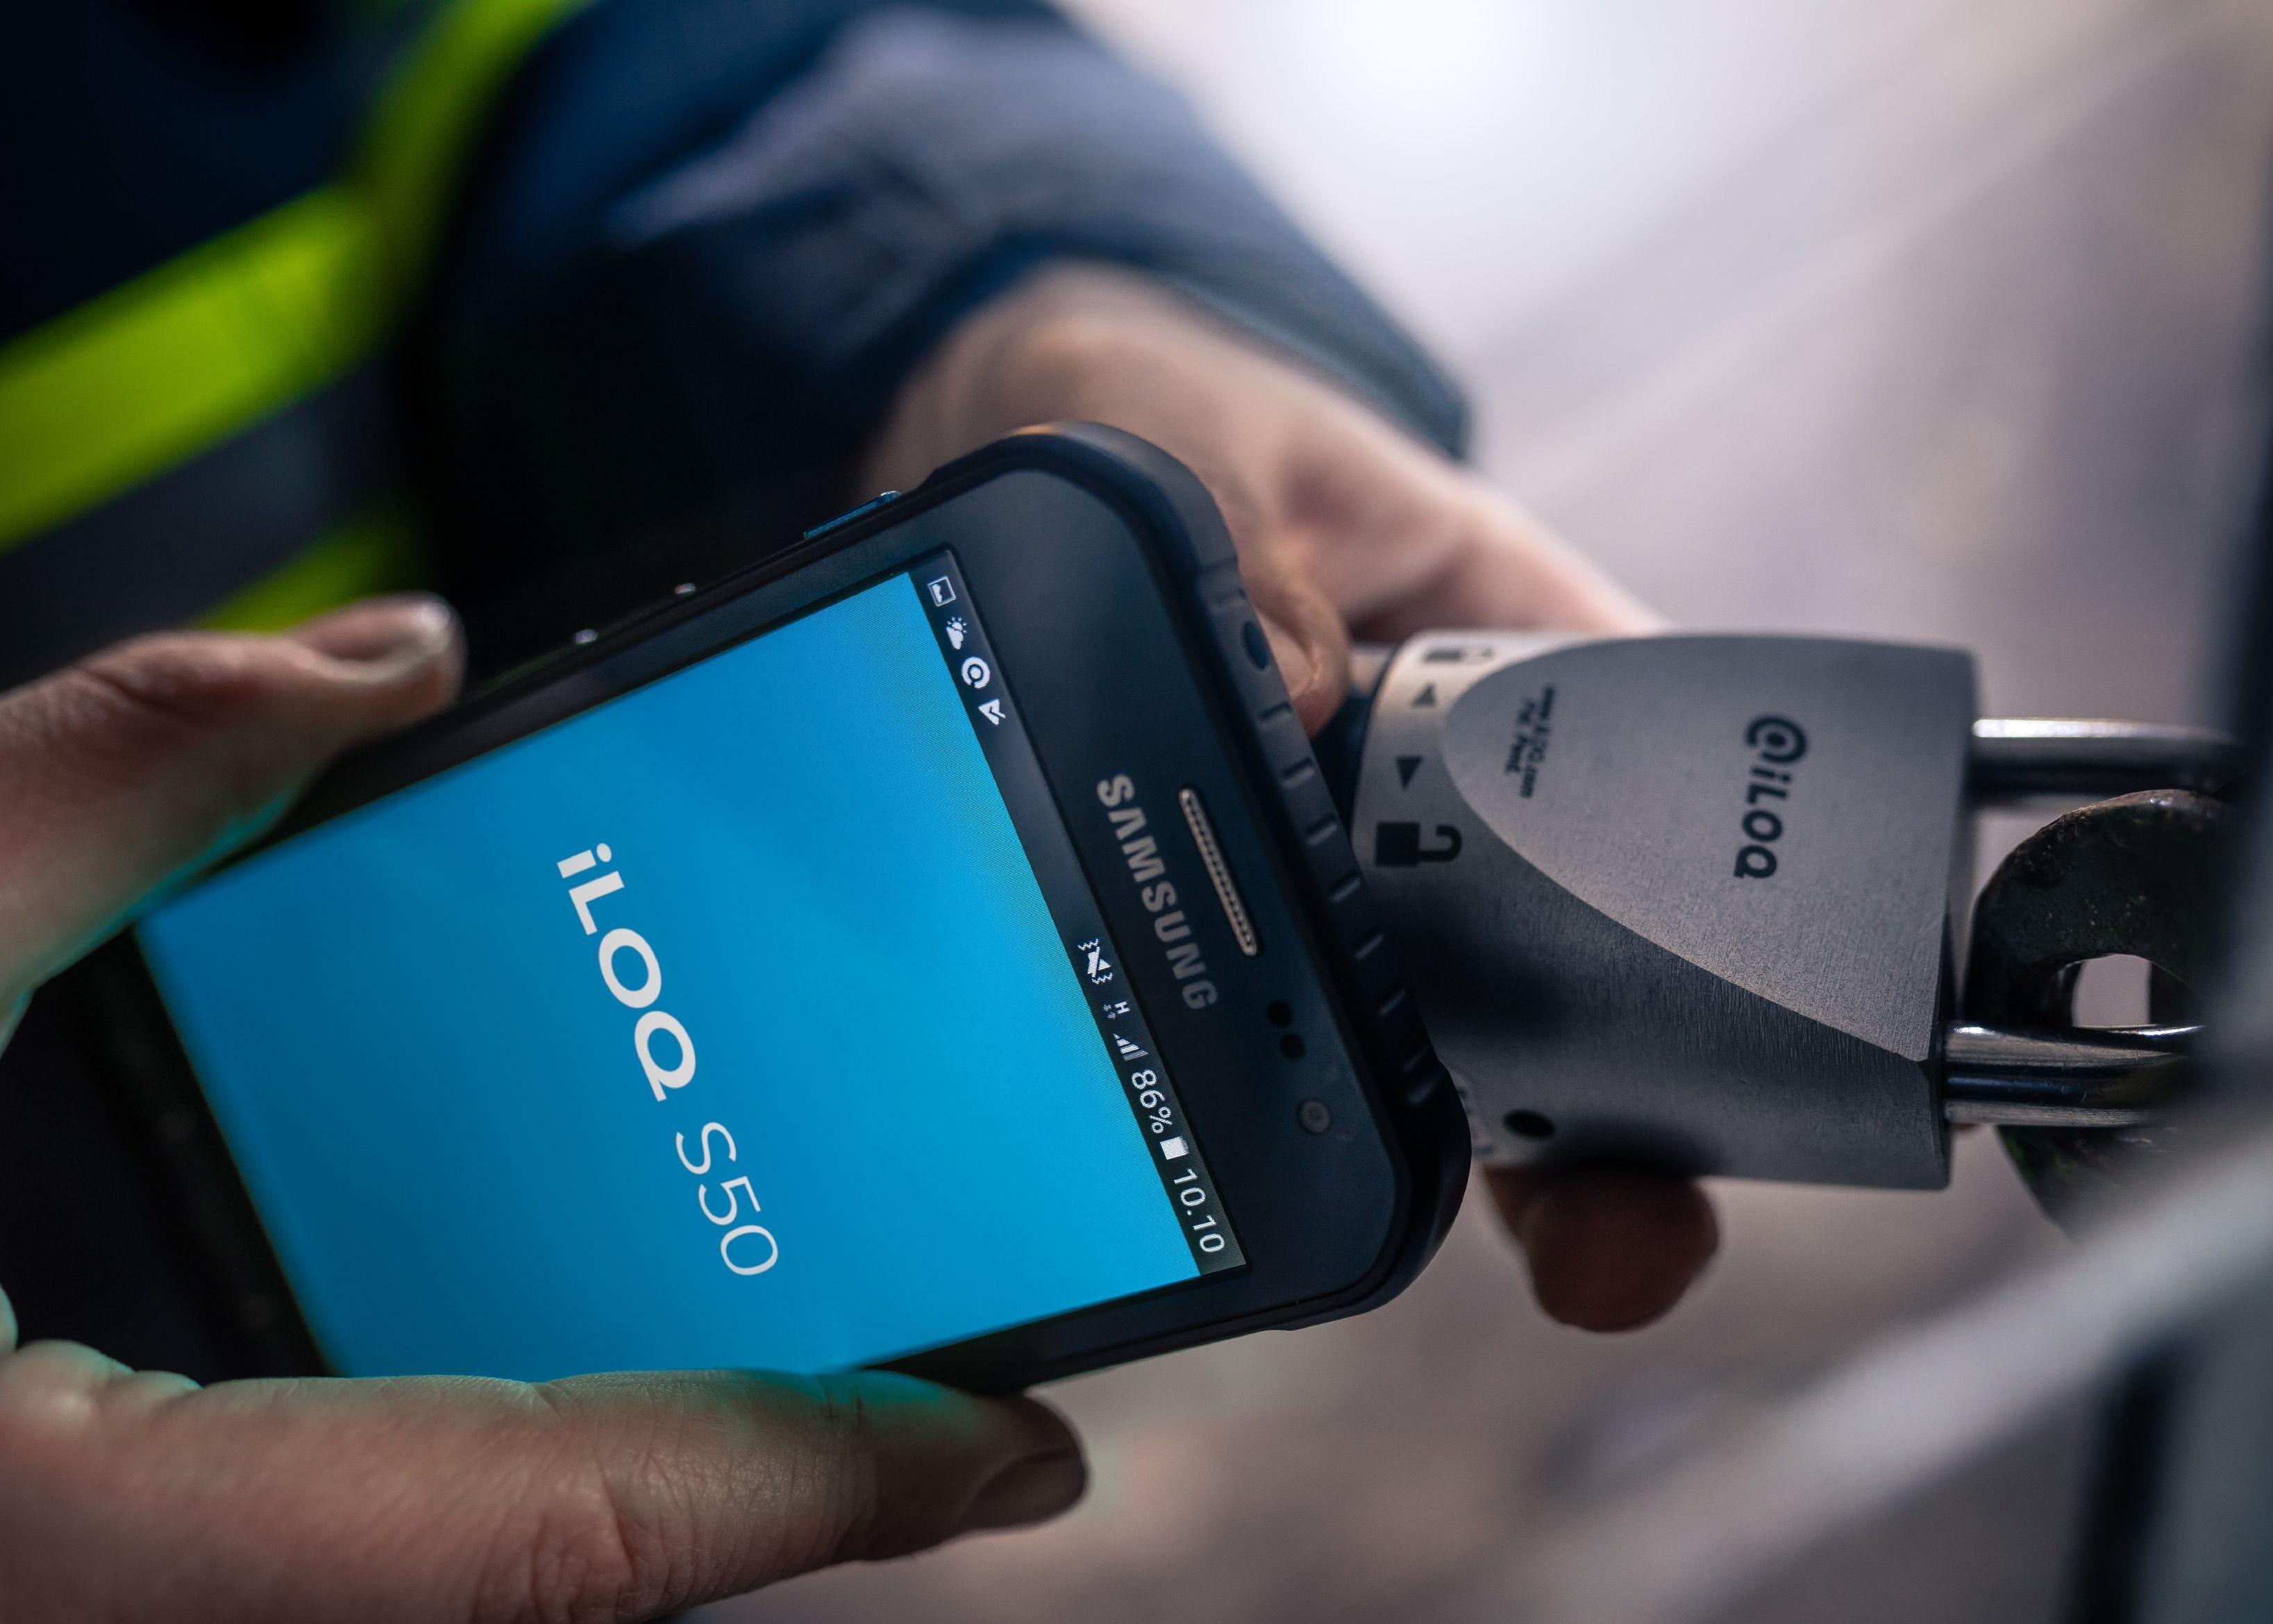 iLOQ_S50_app_7-5